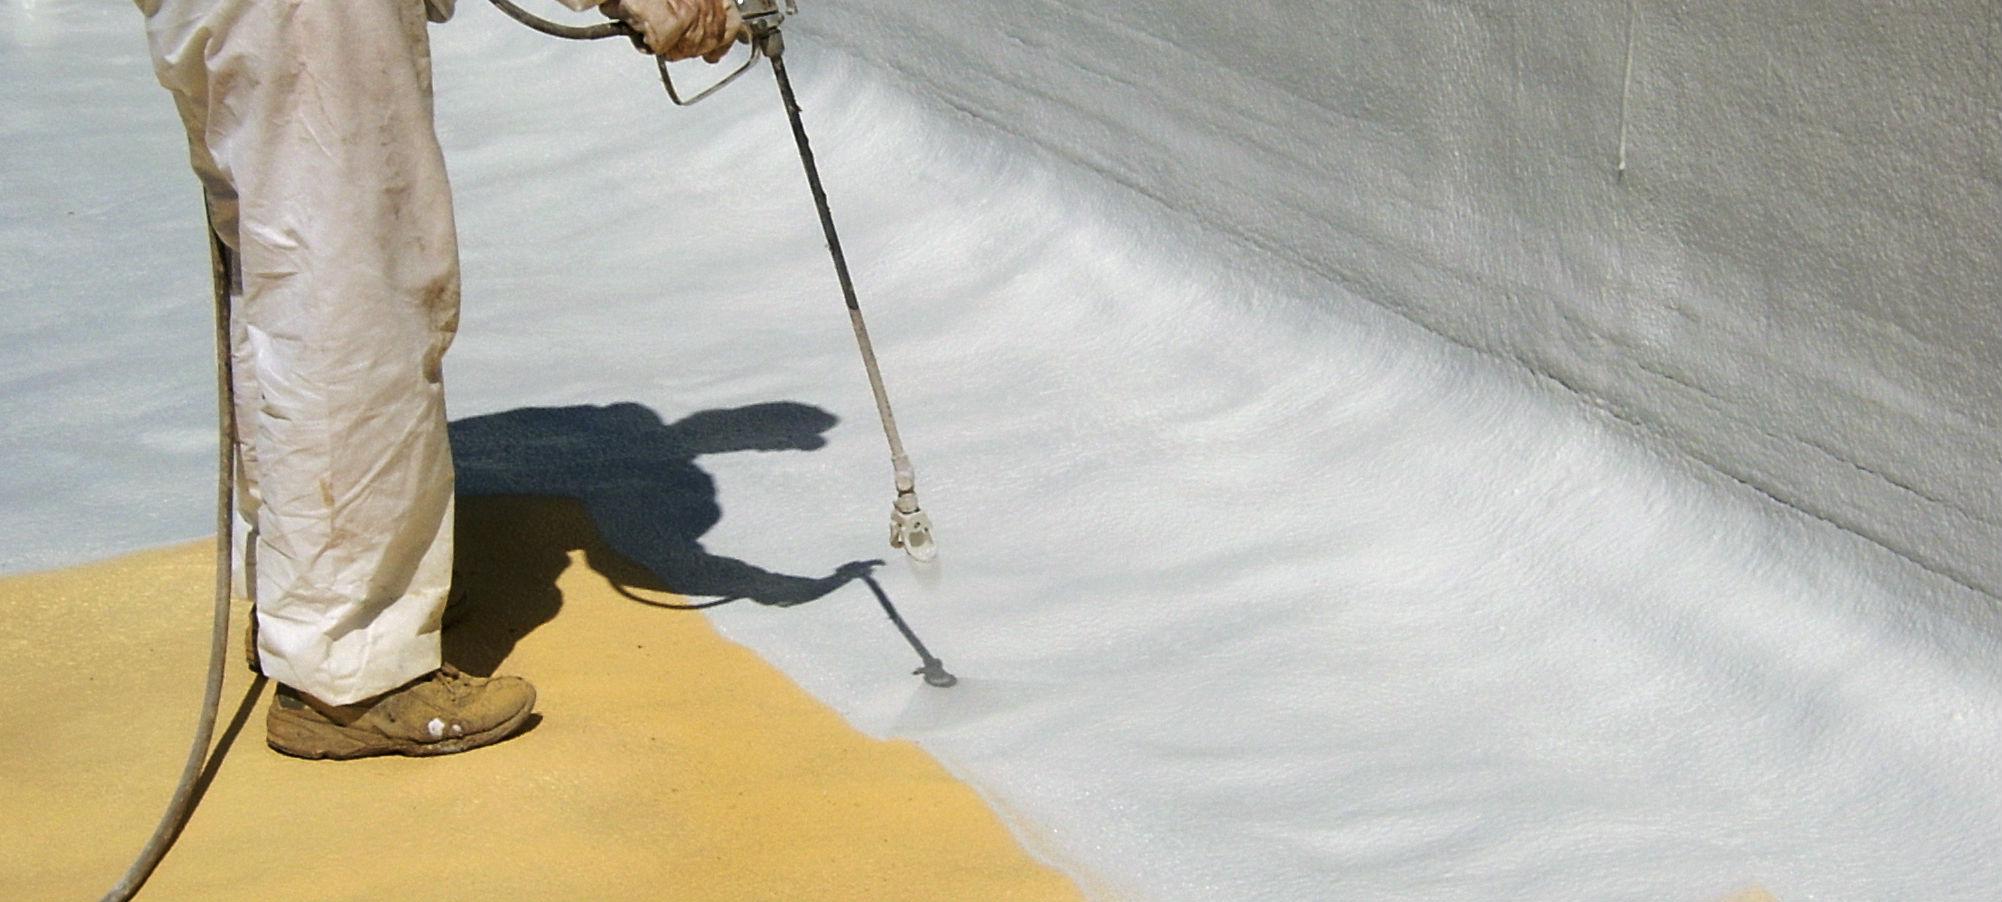 Spray foam insulation san antonio spray roof coating san antonio commercial roofing san antonio